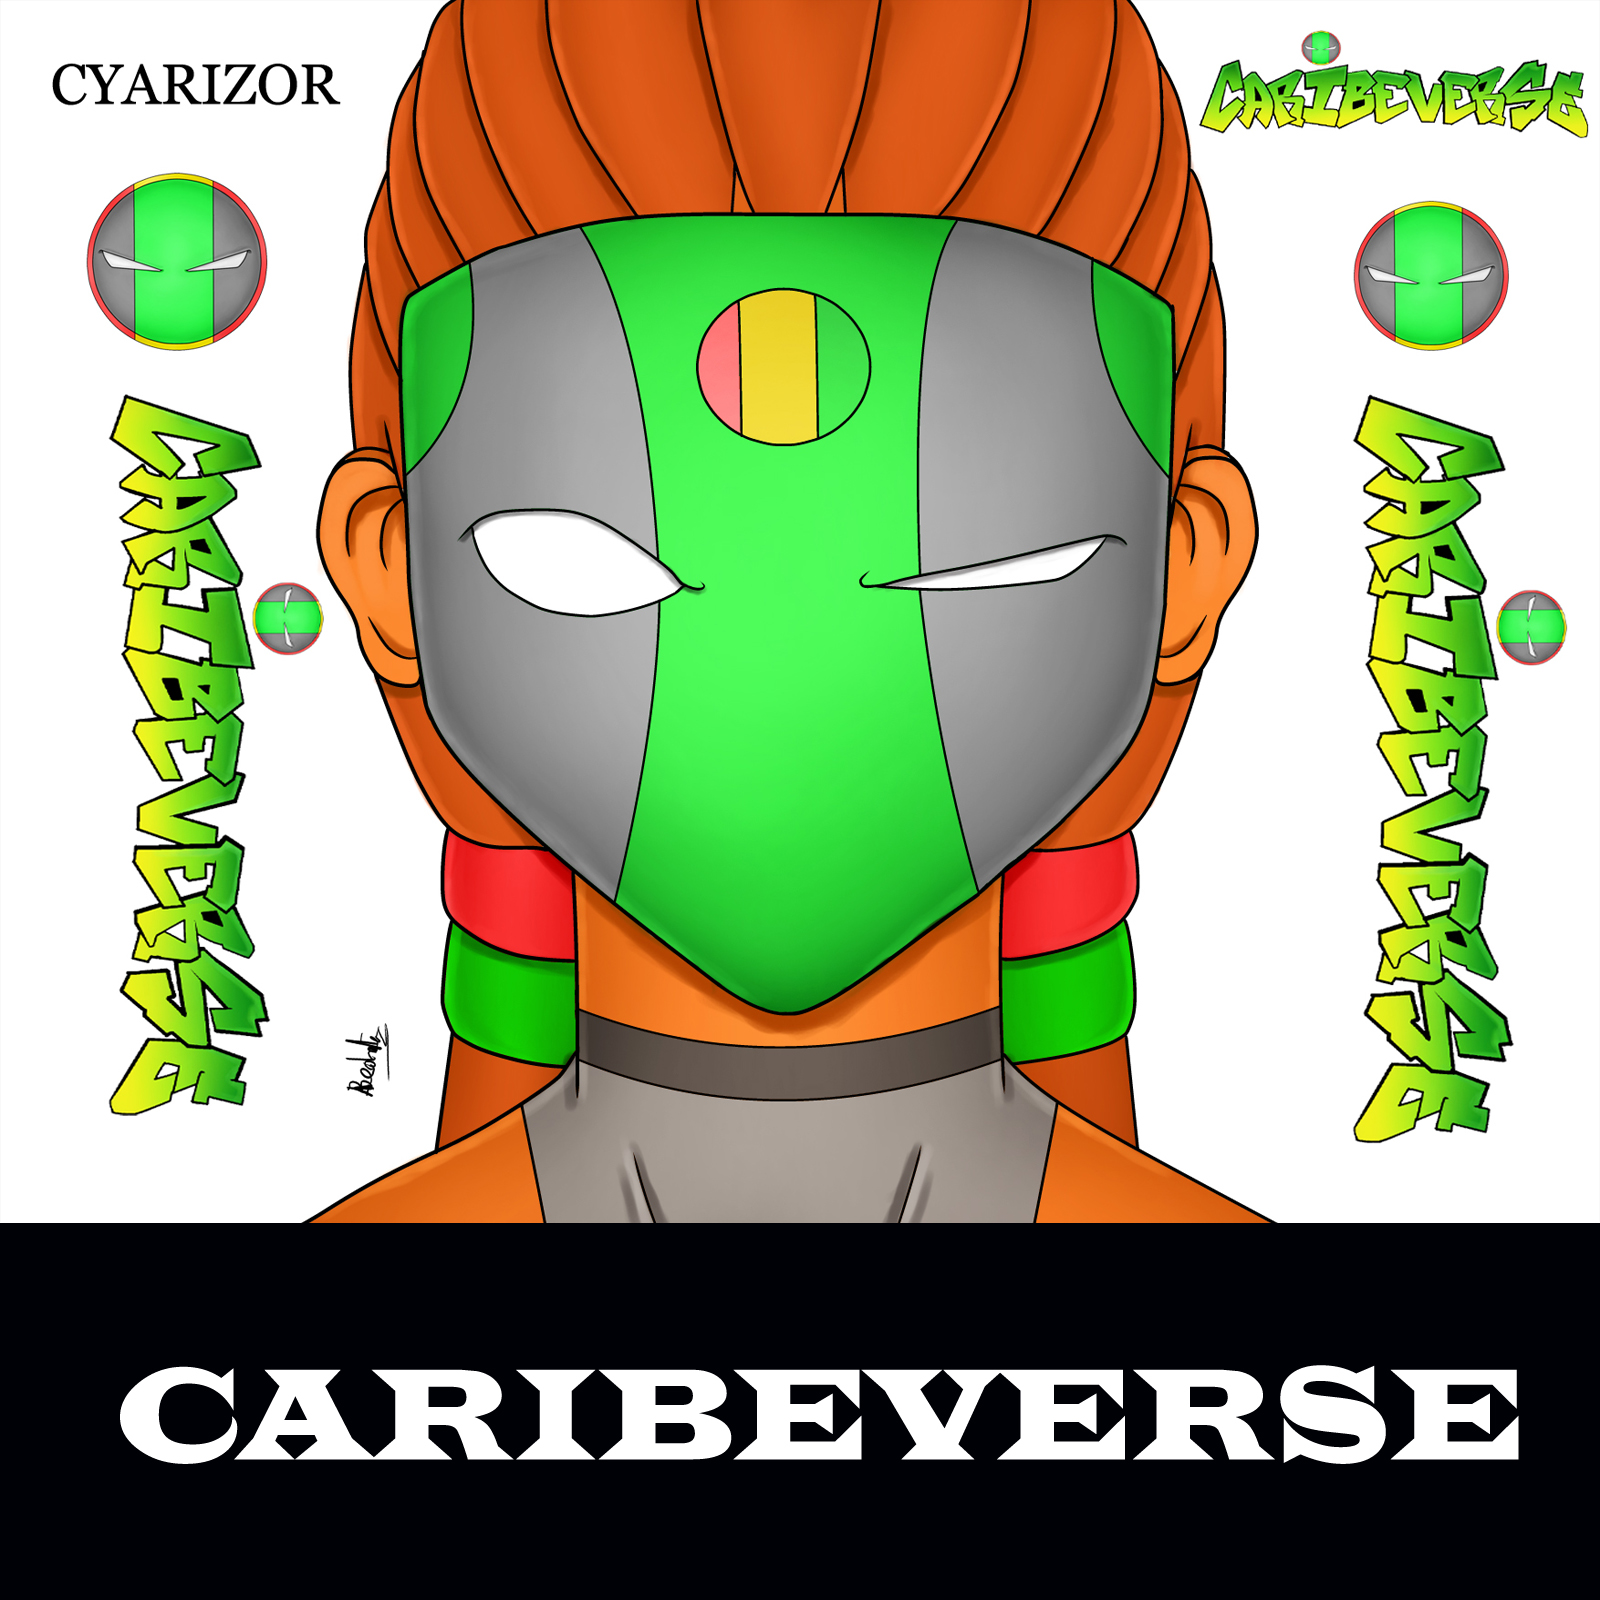 GUADELOUPE BD CARIBERSE HEAD STYLE